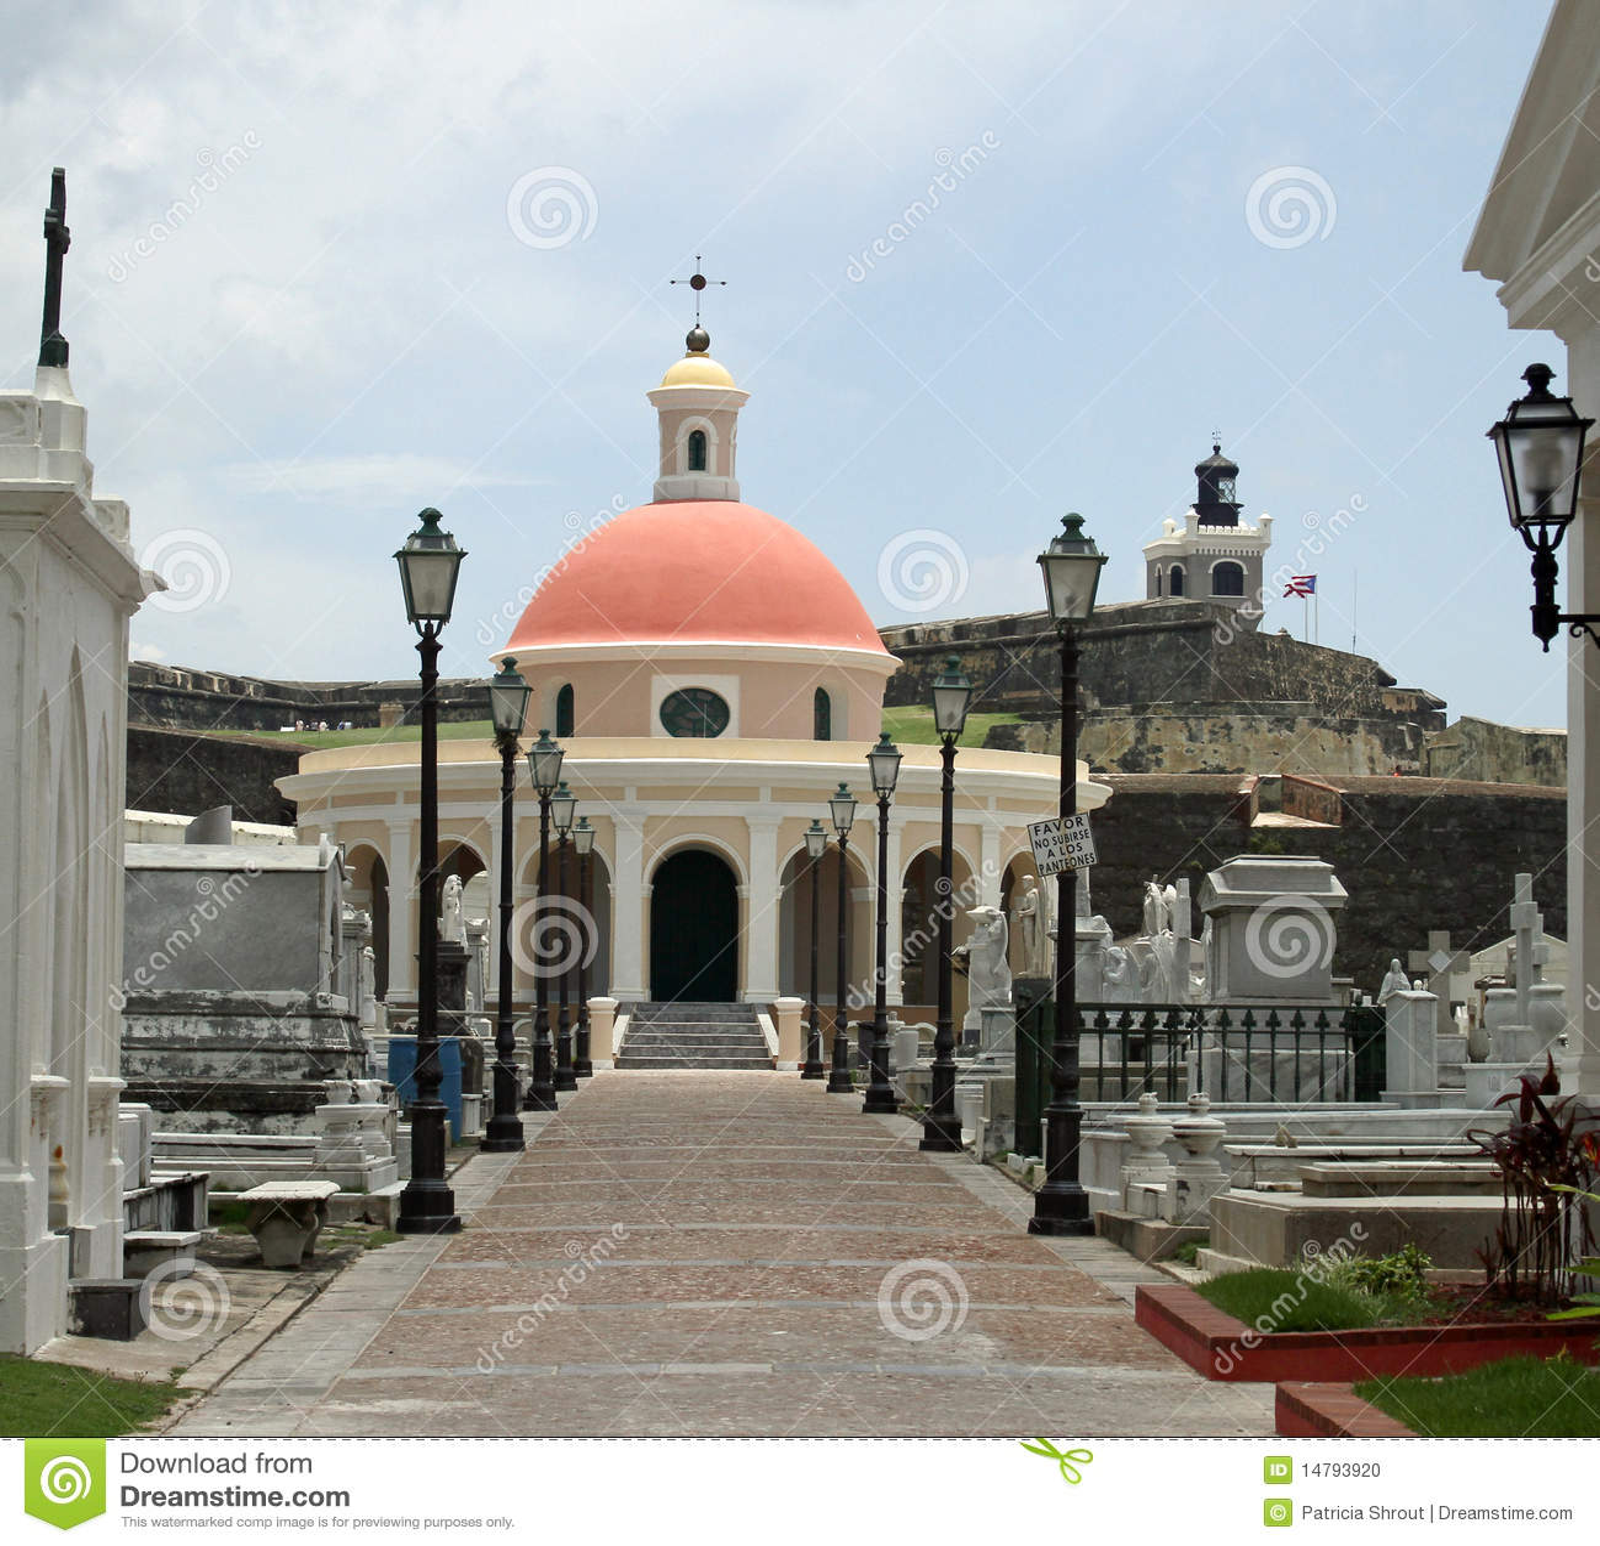 Old San Juan cemetary